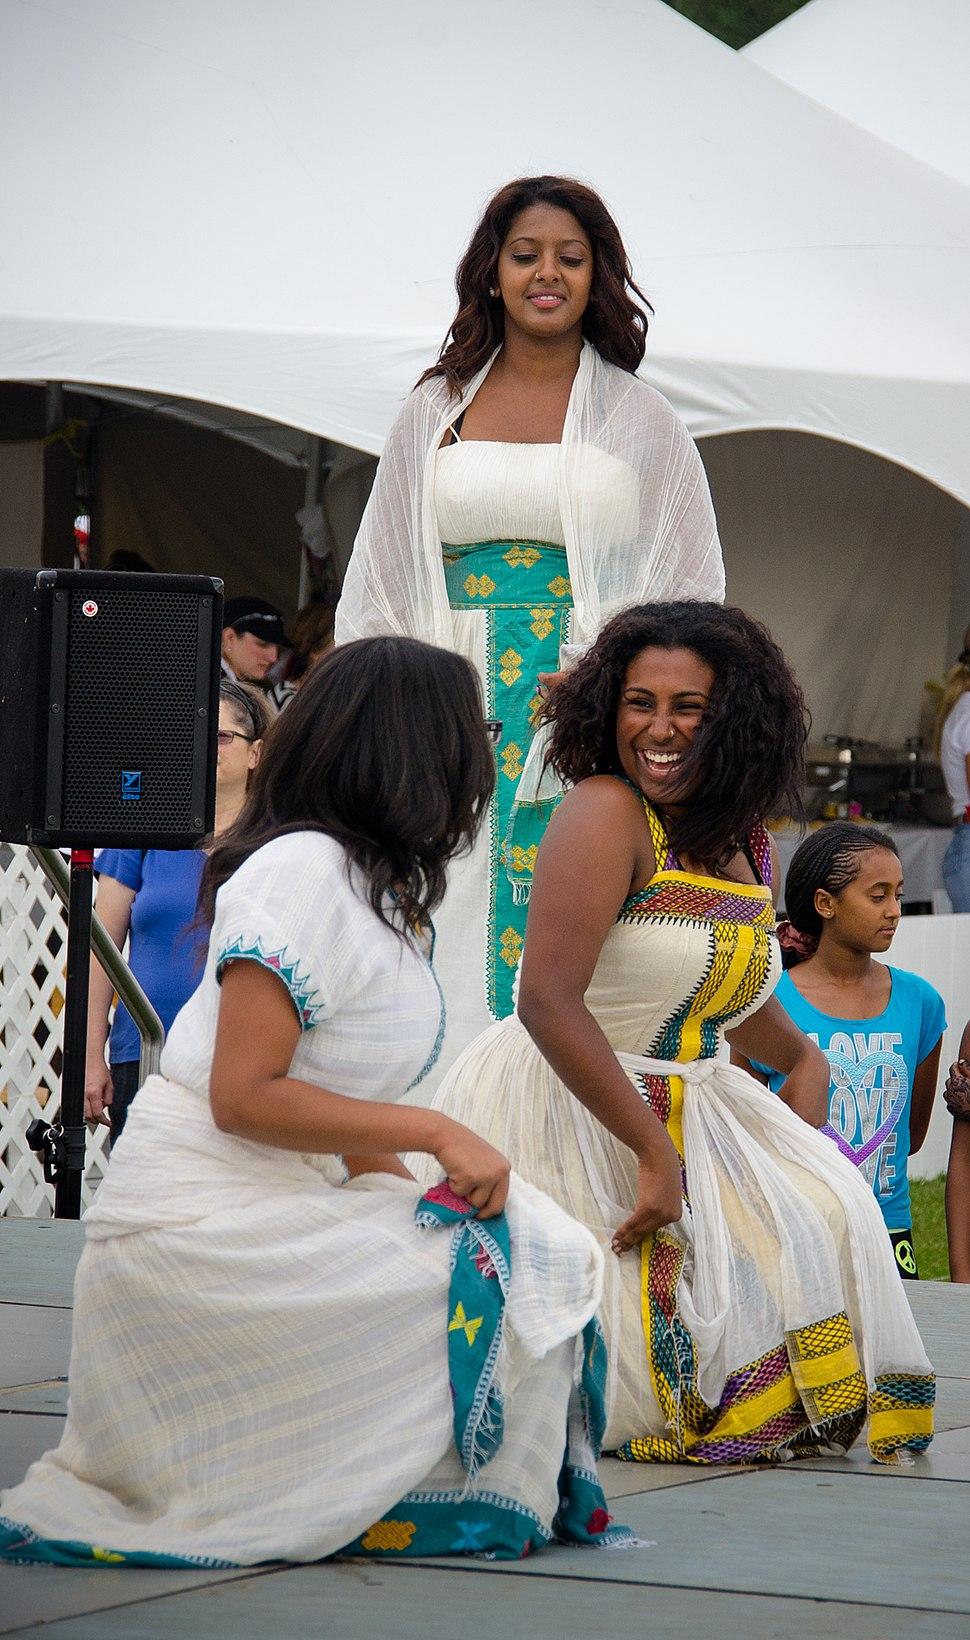 Traditional Eritrean dance